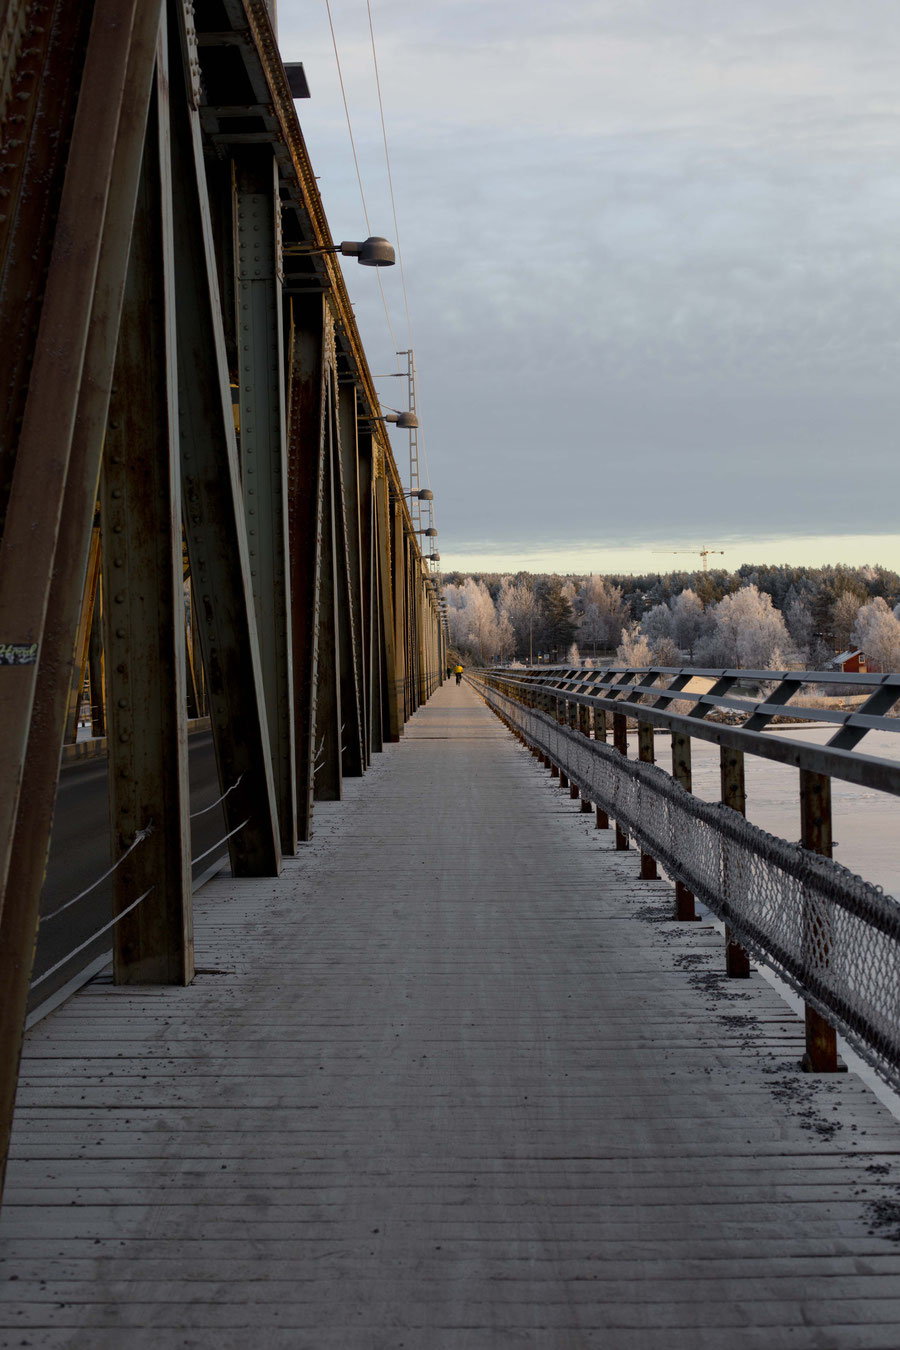 Bridge crossing the Kemijoki, Roveniemi, Finland